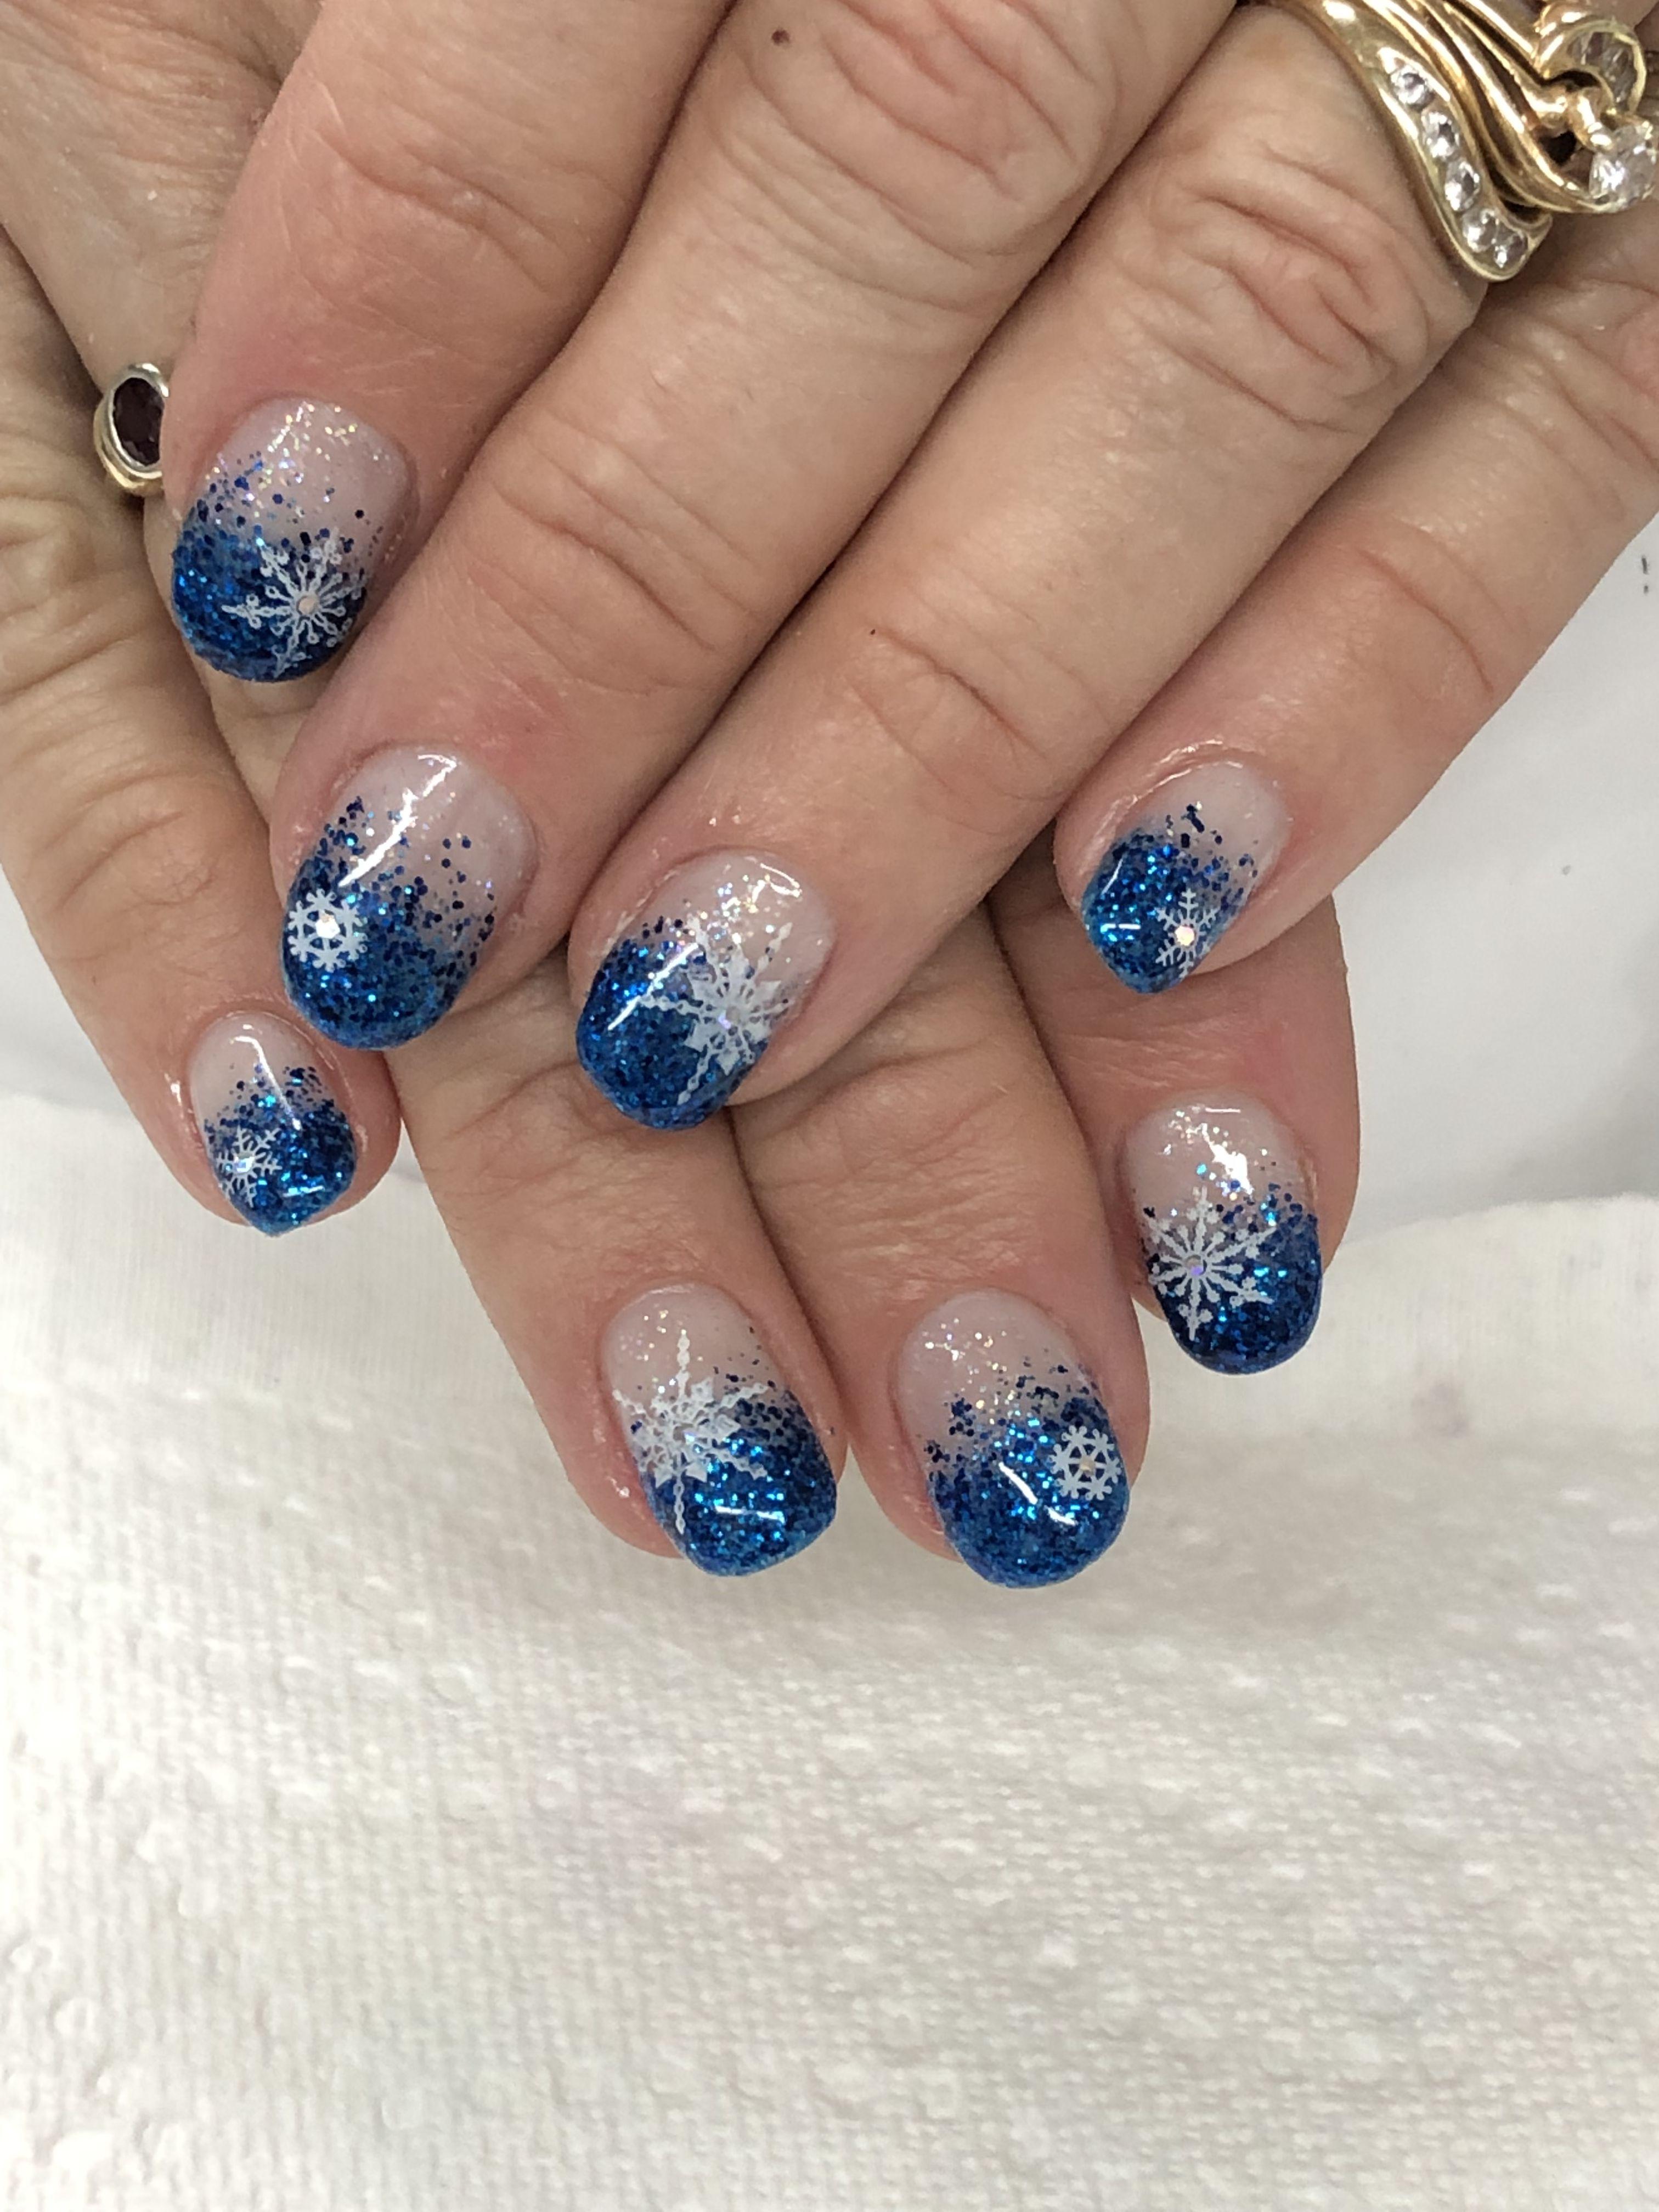 Royal Blue Ombre Glitter Gel Nails Gel Nail Designs Glitter Gel Nails Glitter Gel